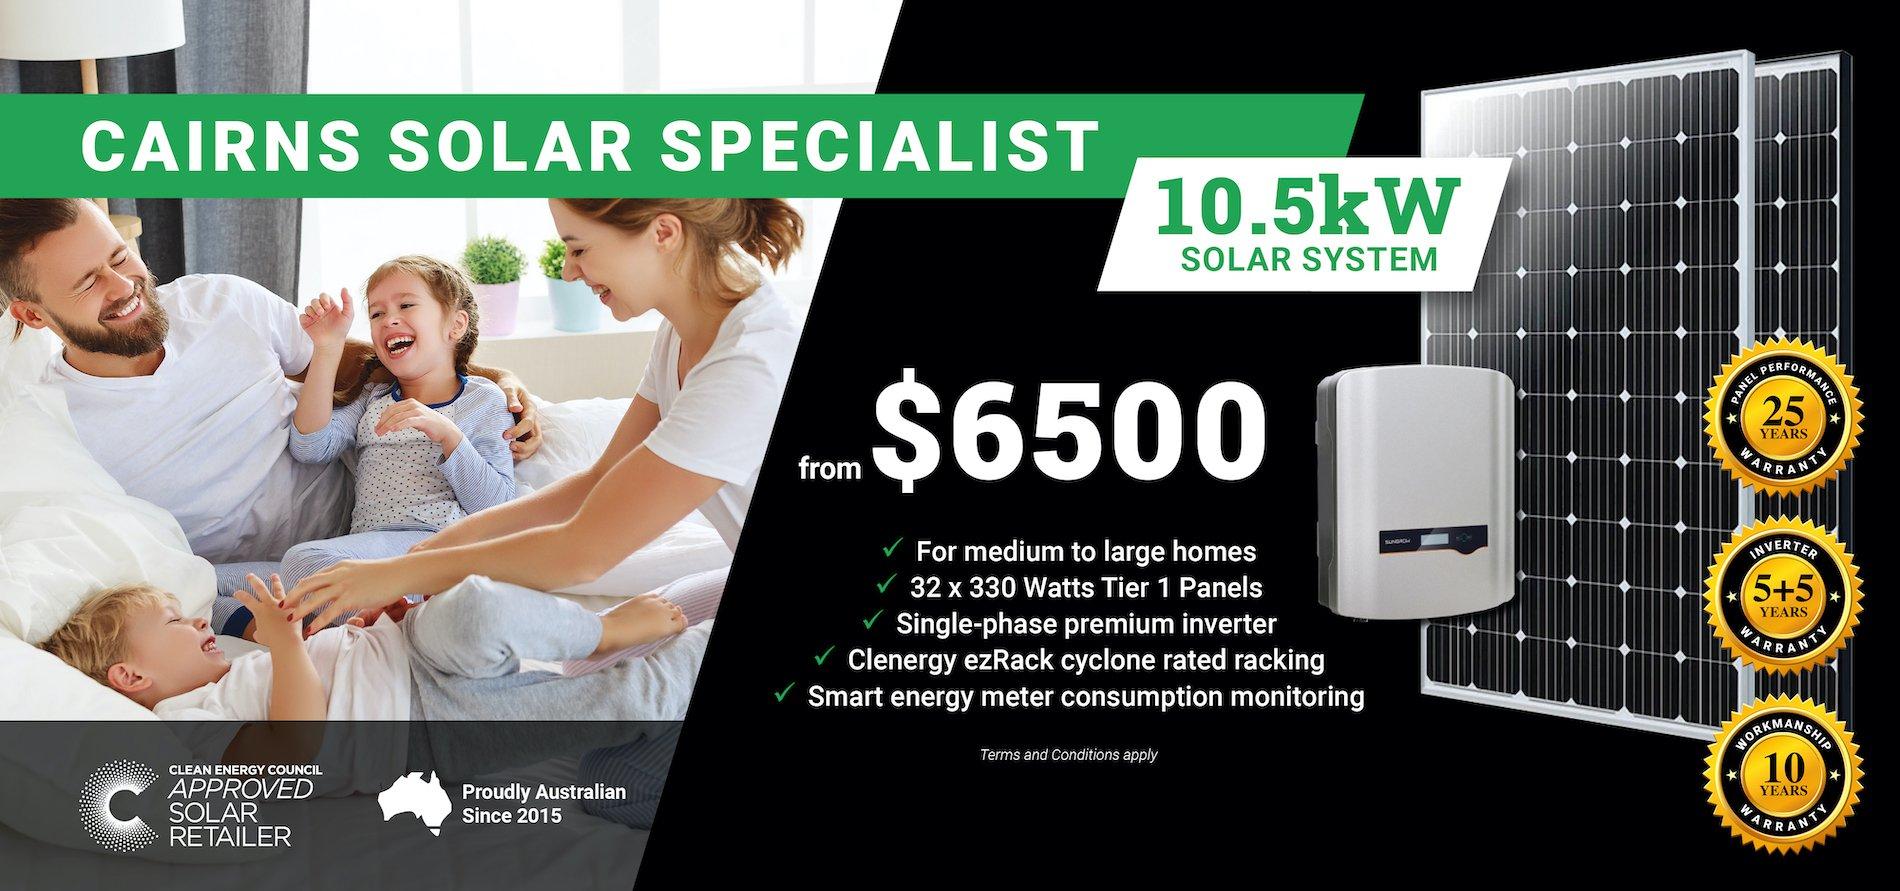 Cairns 10.5kw Solar DT2